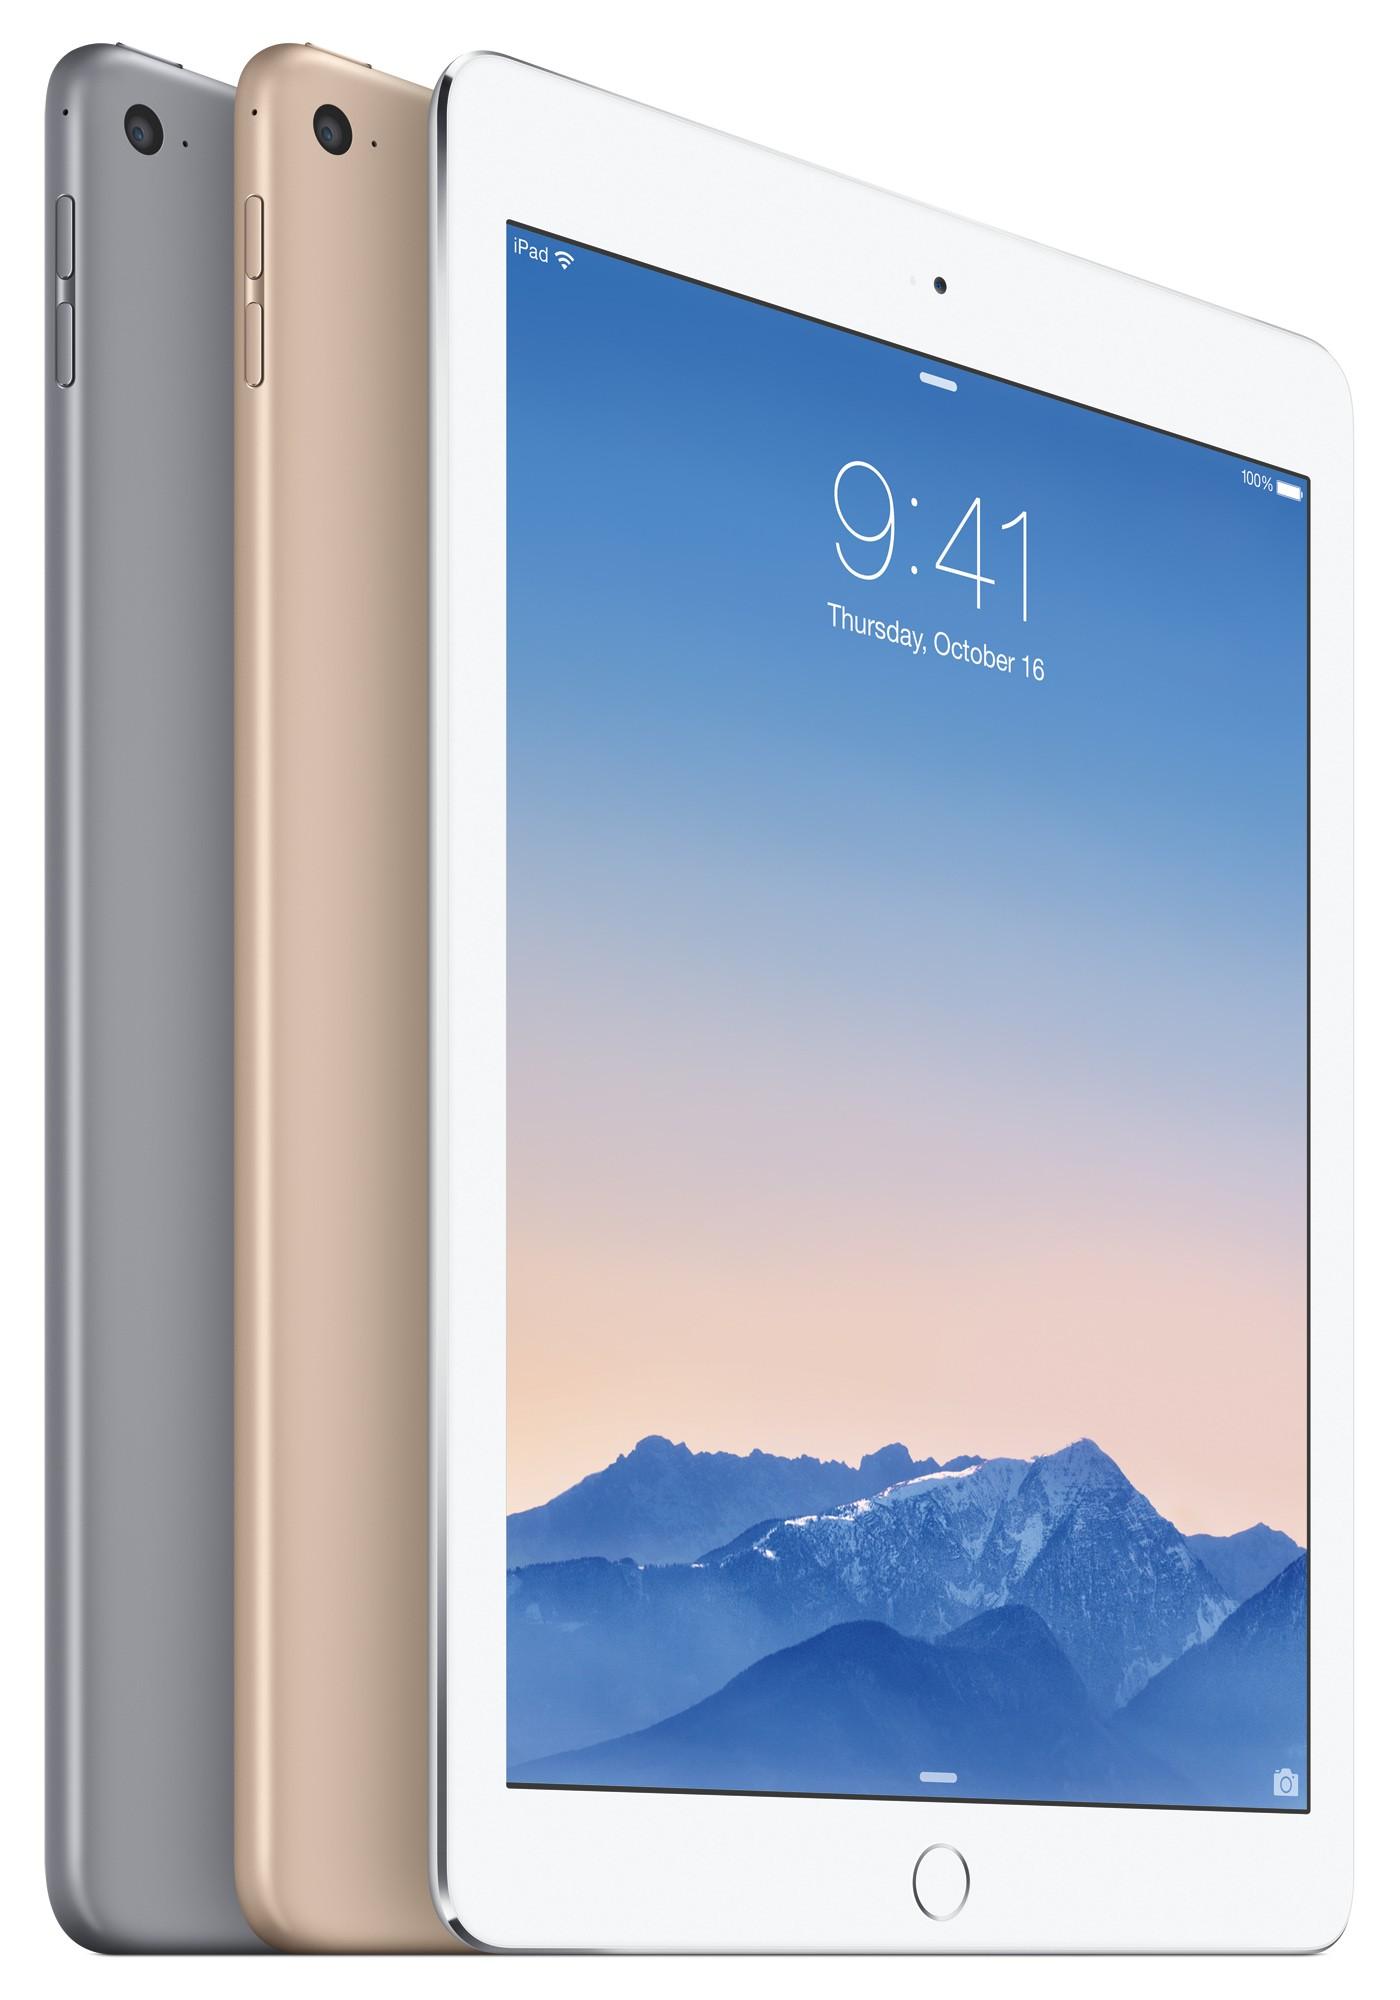 tonpc ma vente mat riel mac au maroc apple tablette ipad air 2 gold 16g wifi cellulaire 4g. Black Bedroom Furniture Sets. Home Design Ideas